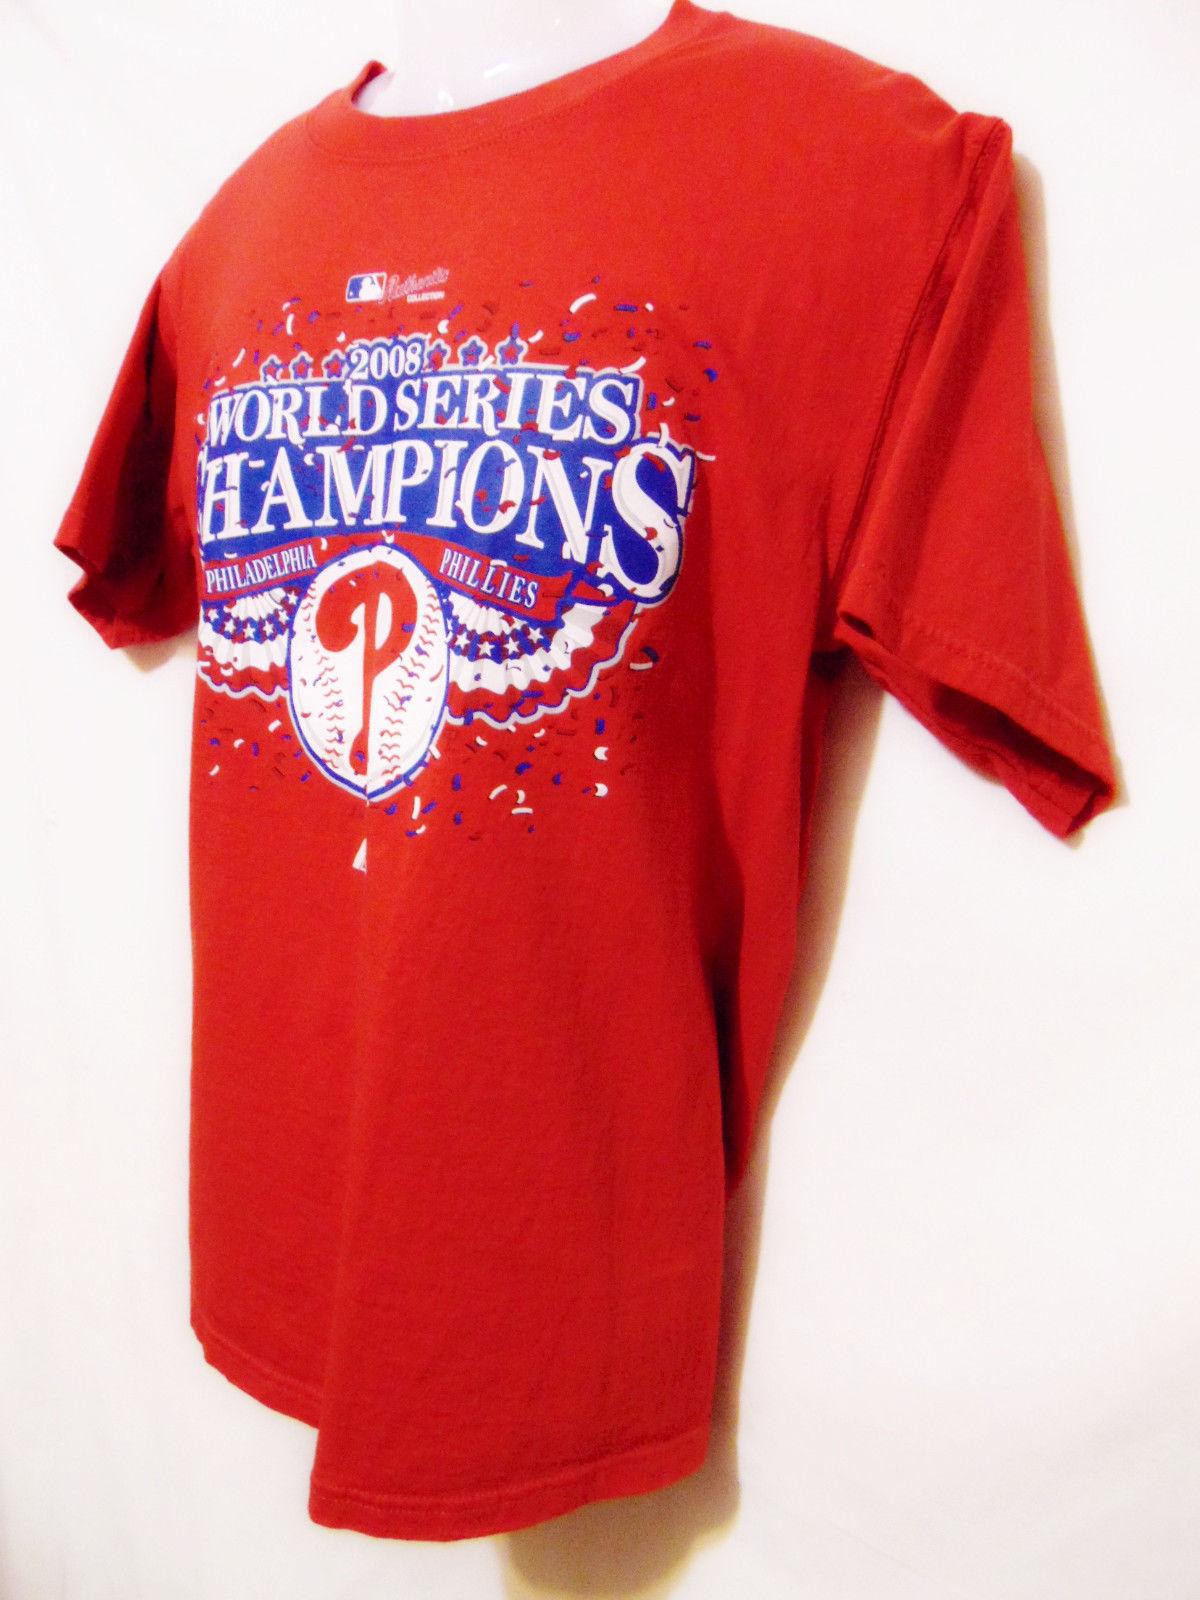 659d5d24 MAJESTIC Philadelphia Phillies 2008 World Series MLB Champions T-Shirt  M/Medium